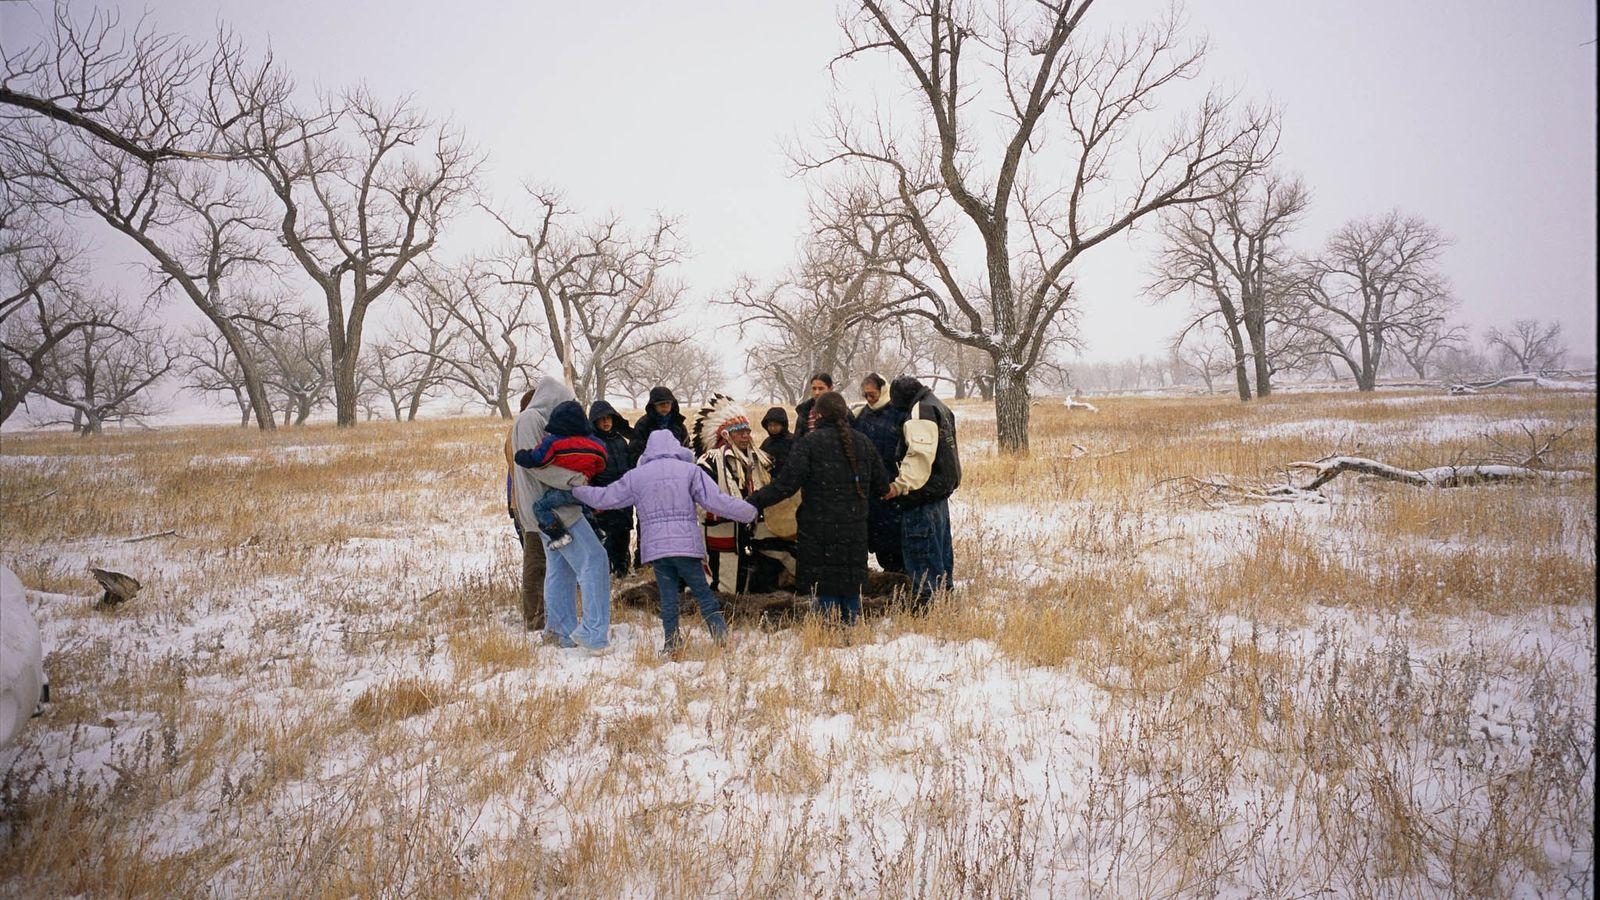 Lakota-Sioux in South Dakota